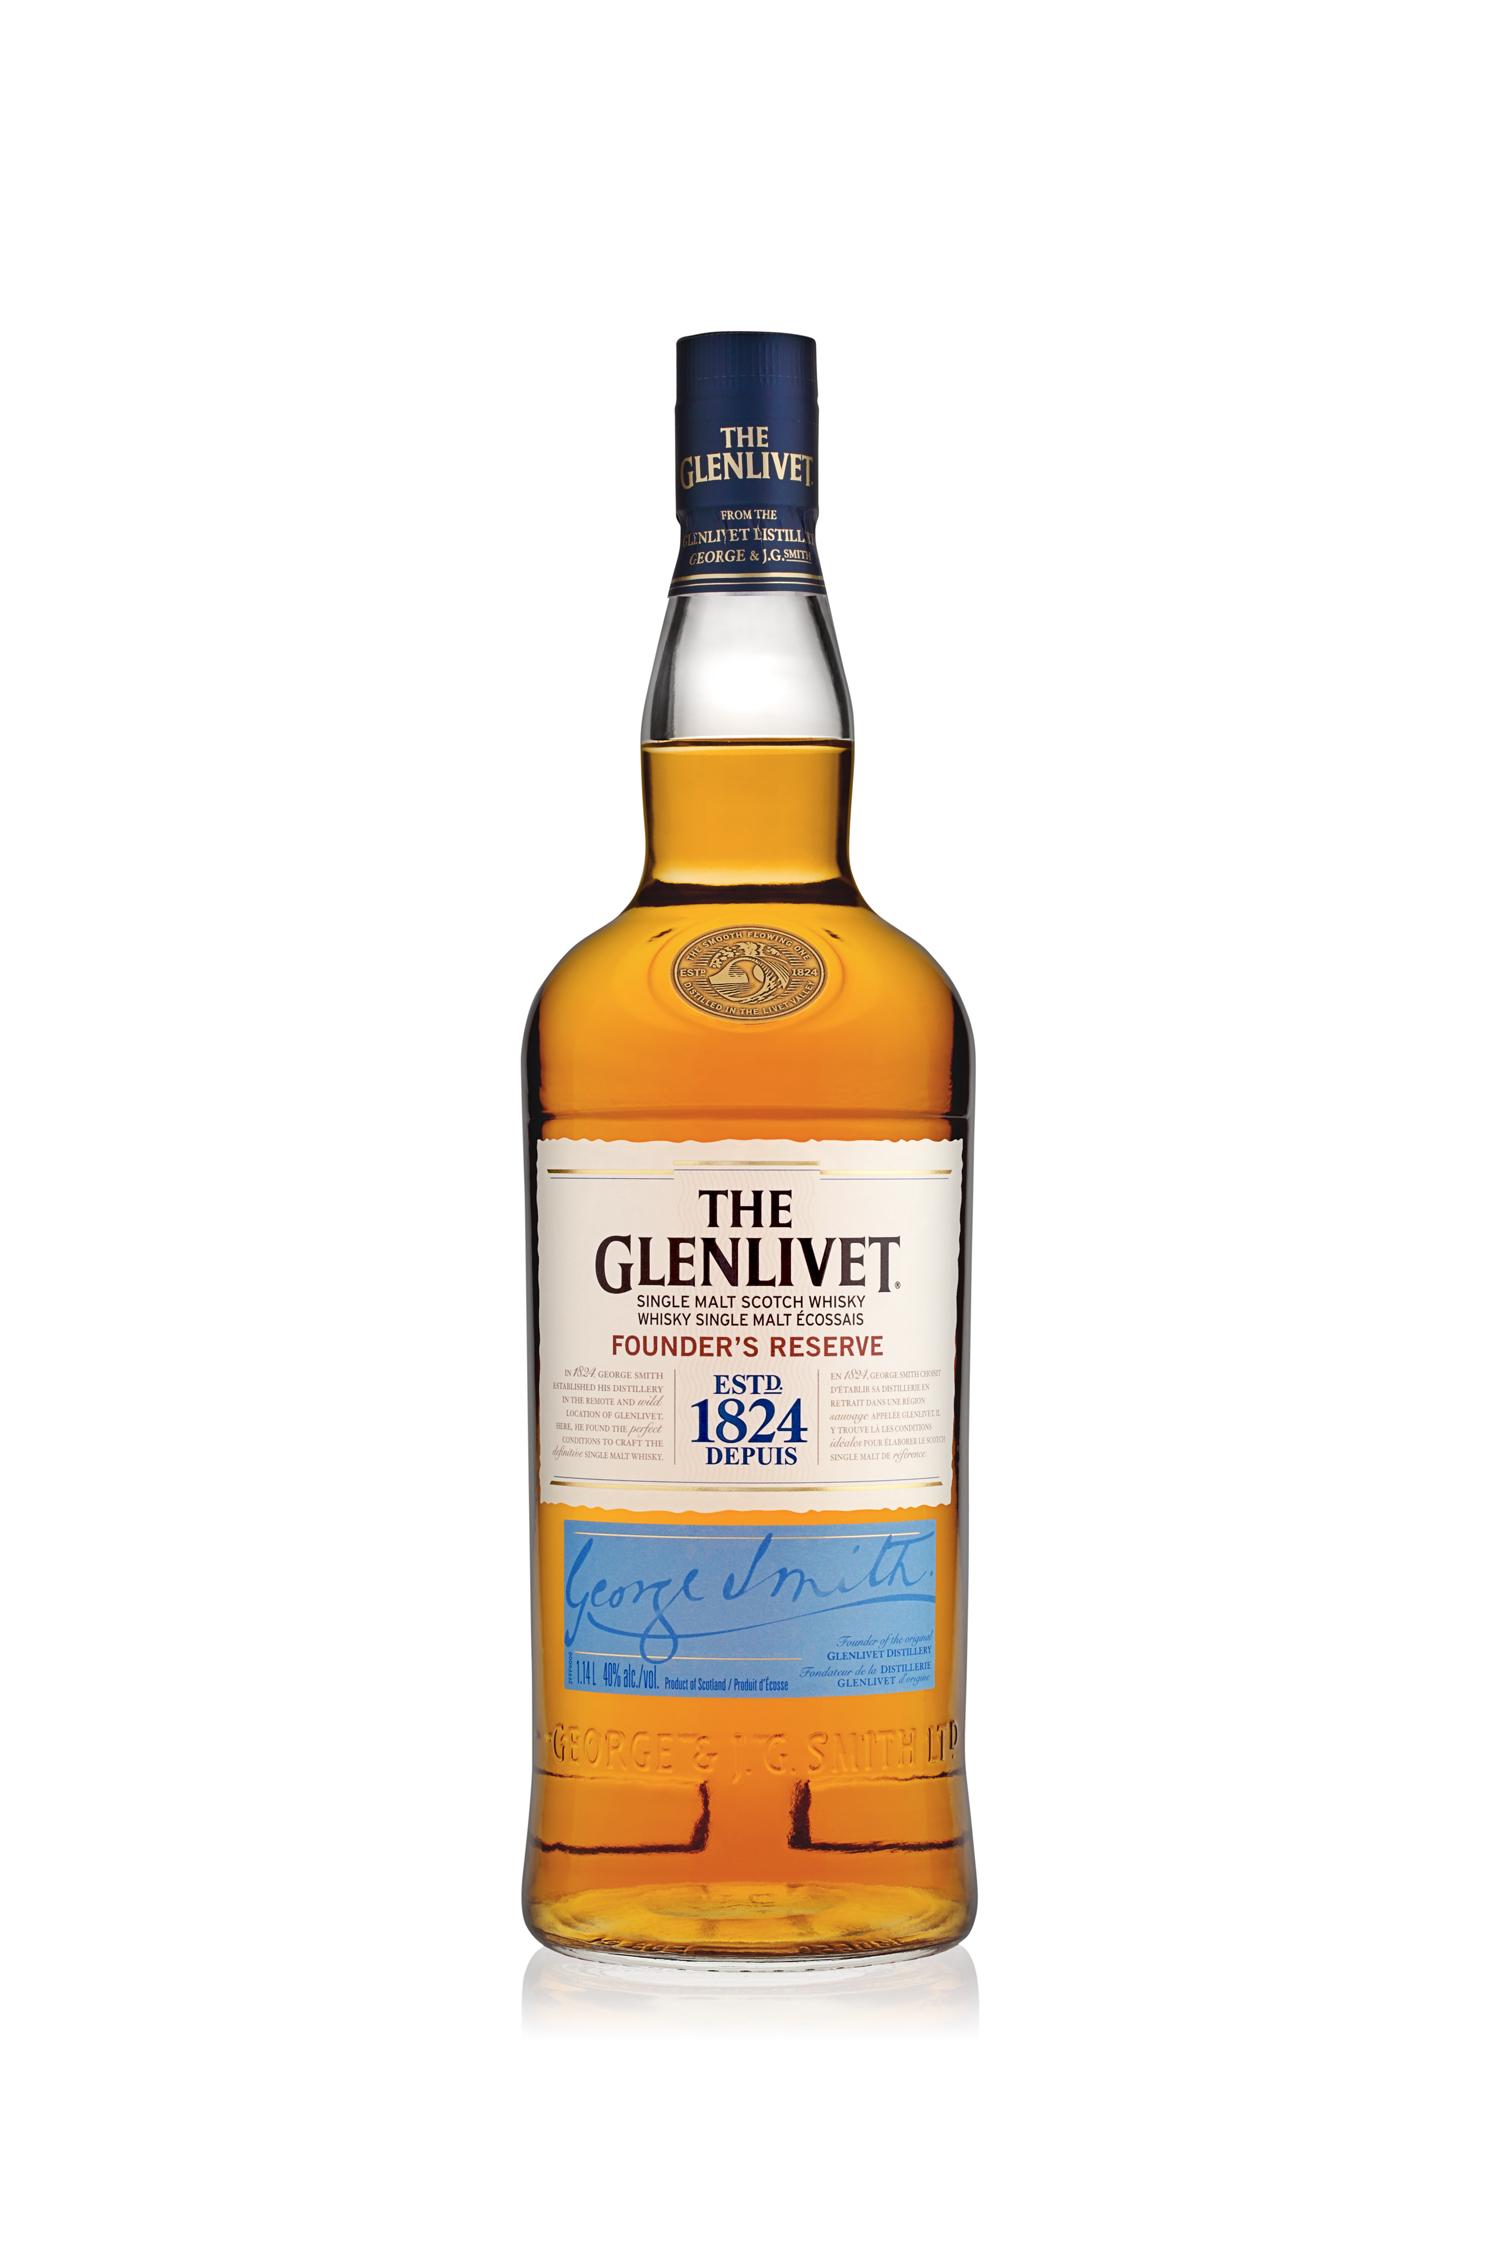 Define single malt scotch